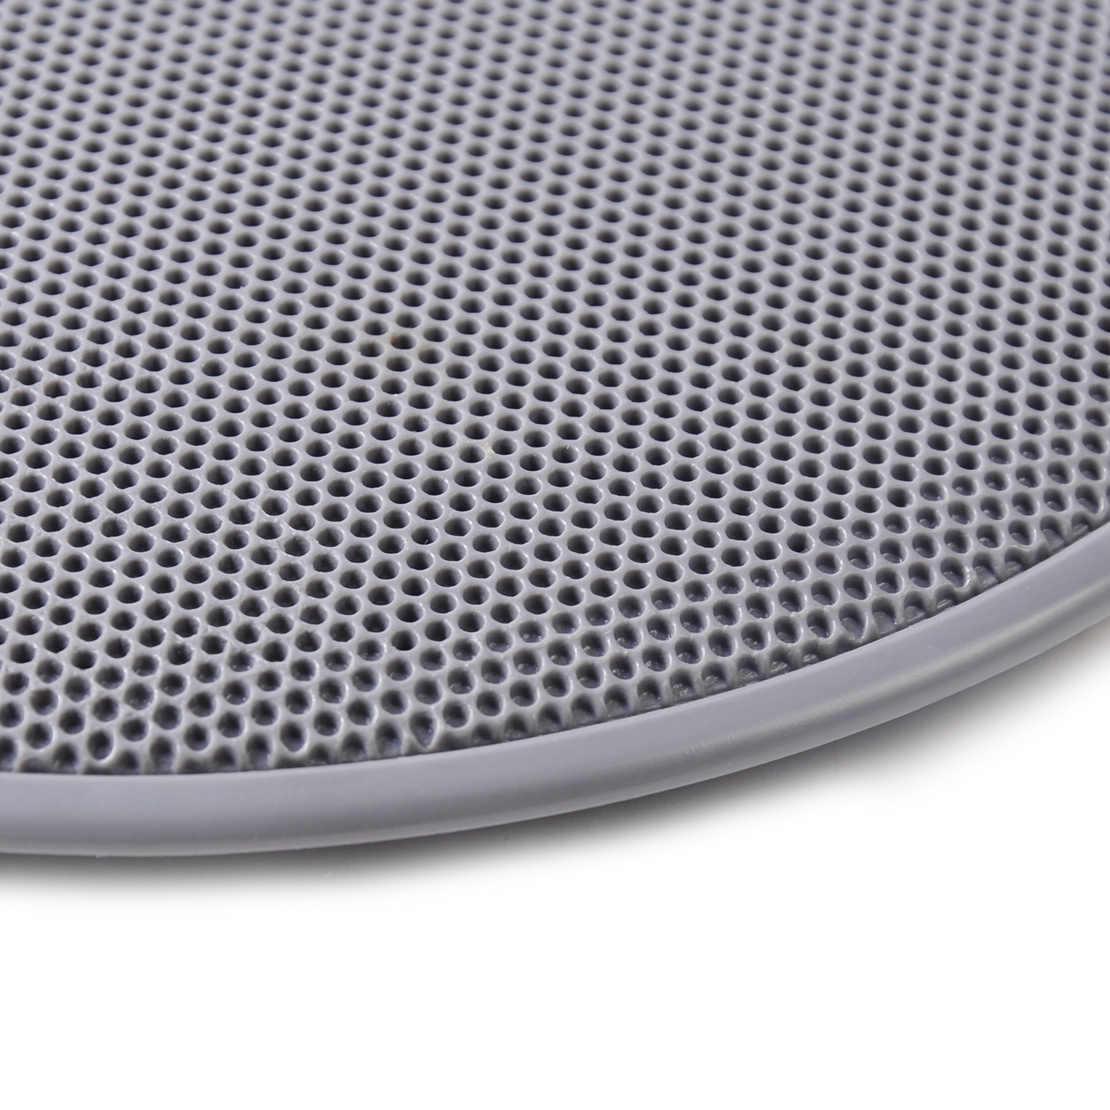 small resolution of  dwcx 2x door loud speaker cover grill 3b0868149 for volkswagen passat b5 jetta mk4 golf gti